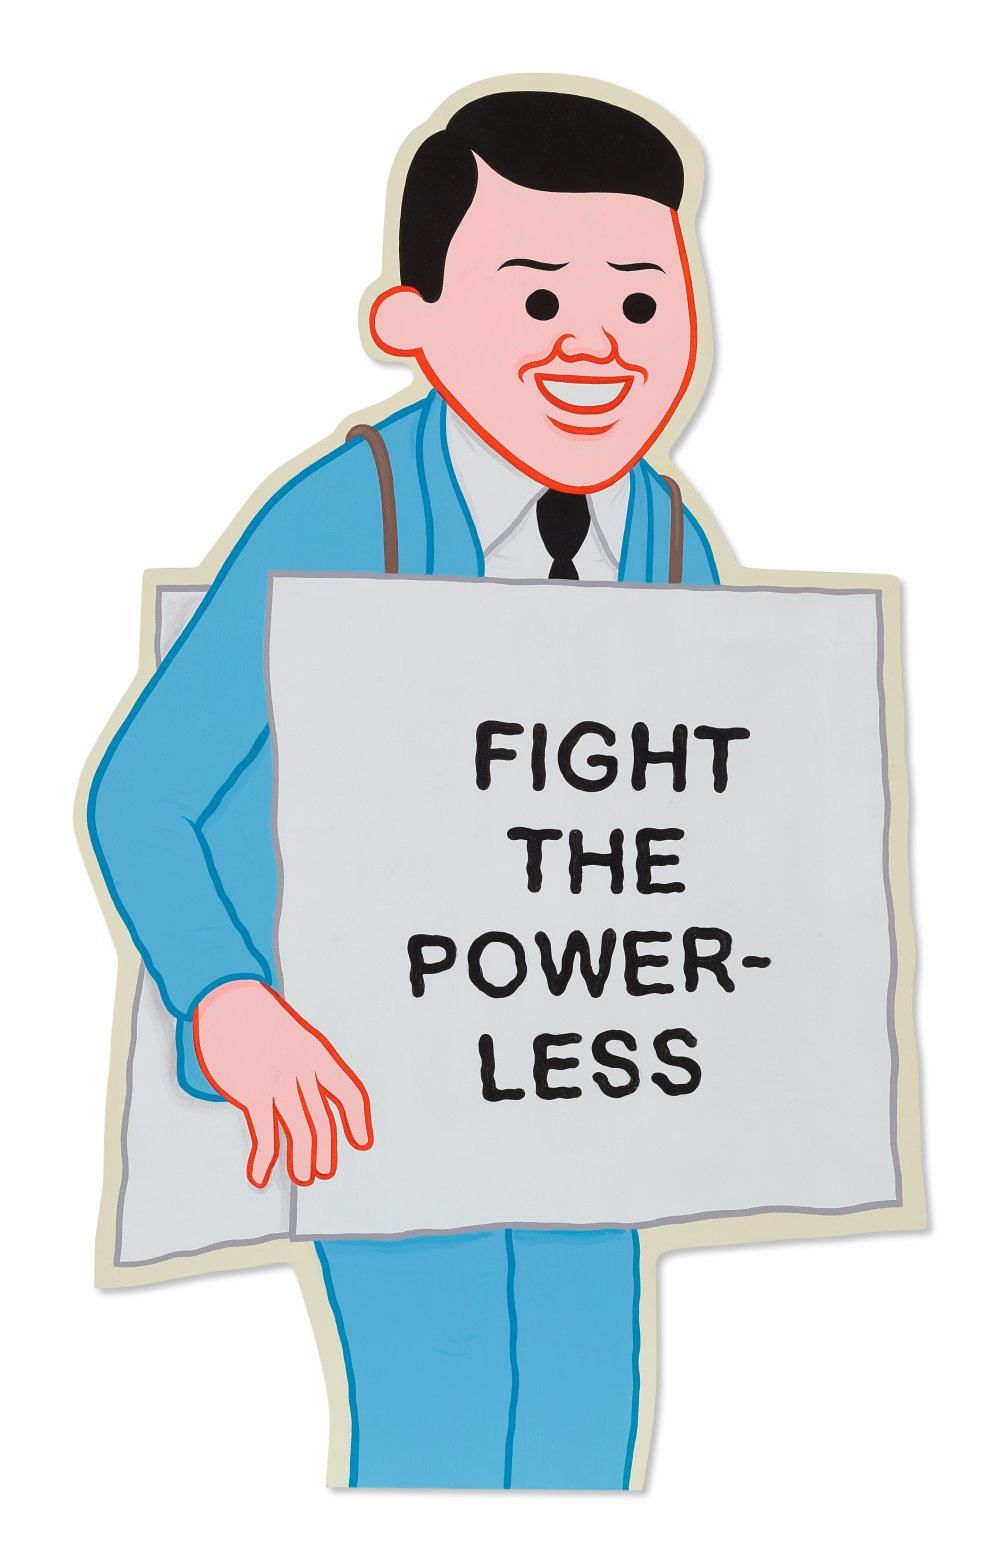 Fight the powerless